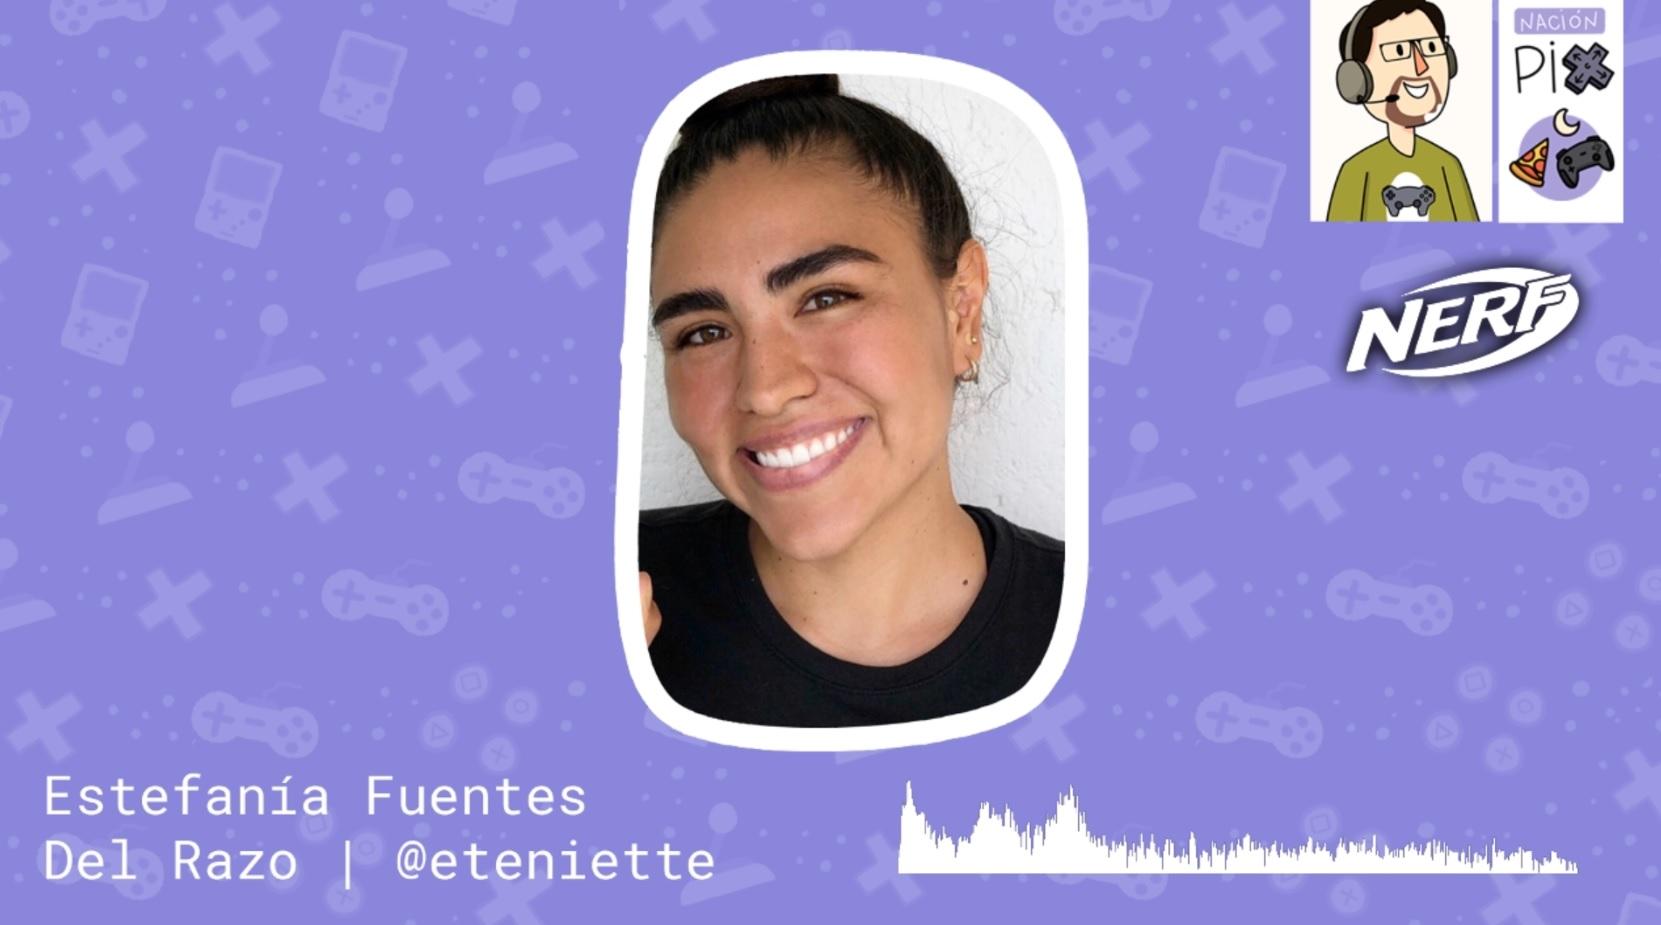 Estefania Fuentes del Razo NERF House